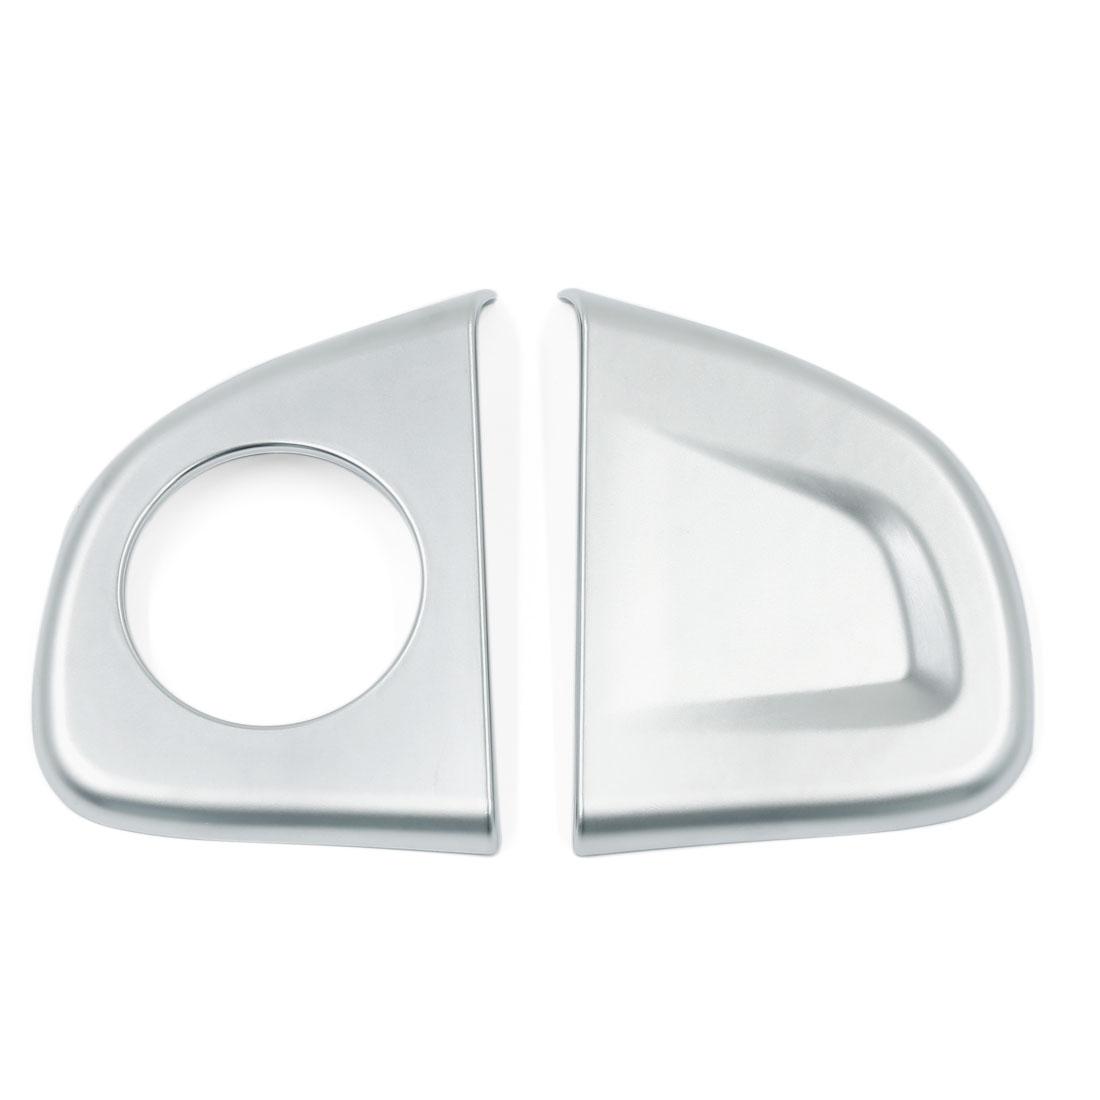 2 Pcs ABS Chrome Adhesive Car Steering Wheel Cover Trim for Honda CRV CR-V 2012-2015